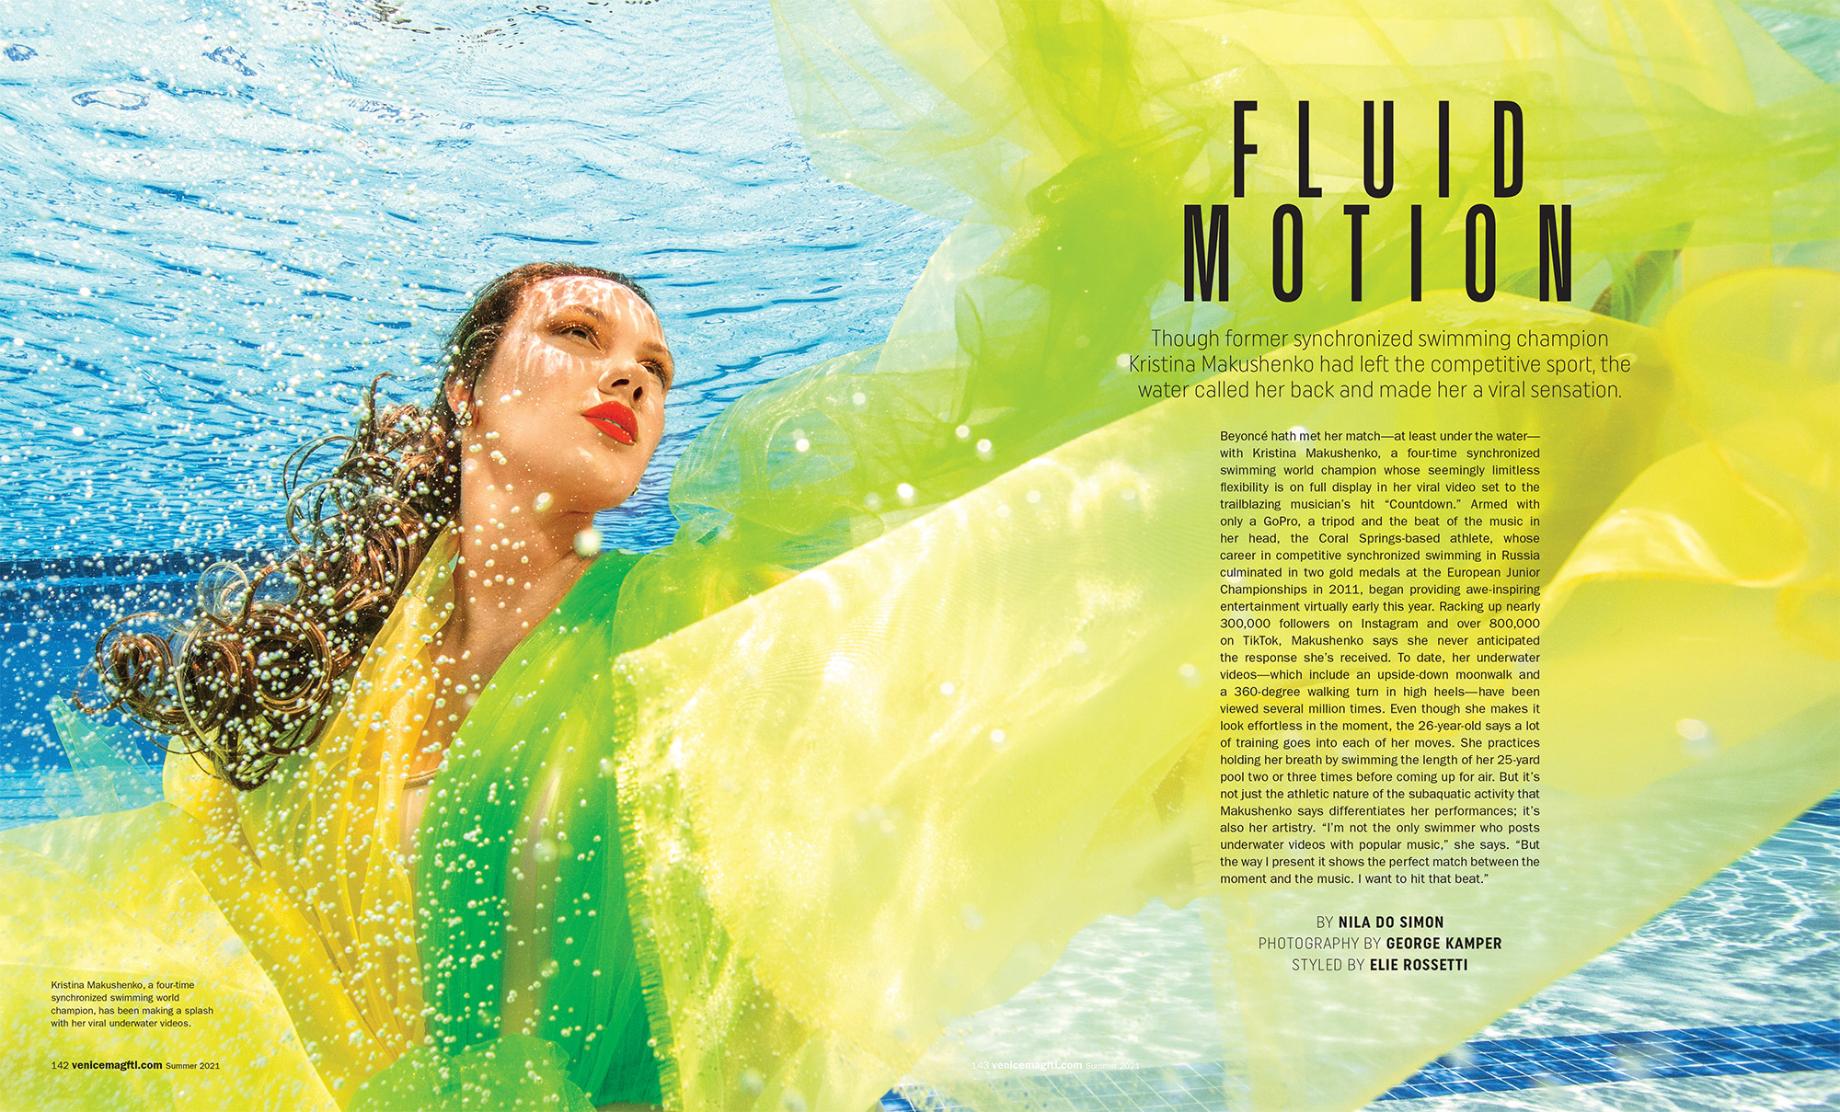 Tear sheet of Venice magazine feature on Kristina Makushenko shot by George Kamper